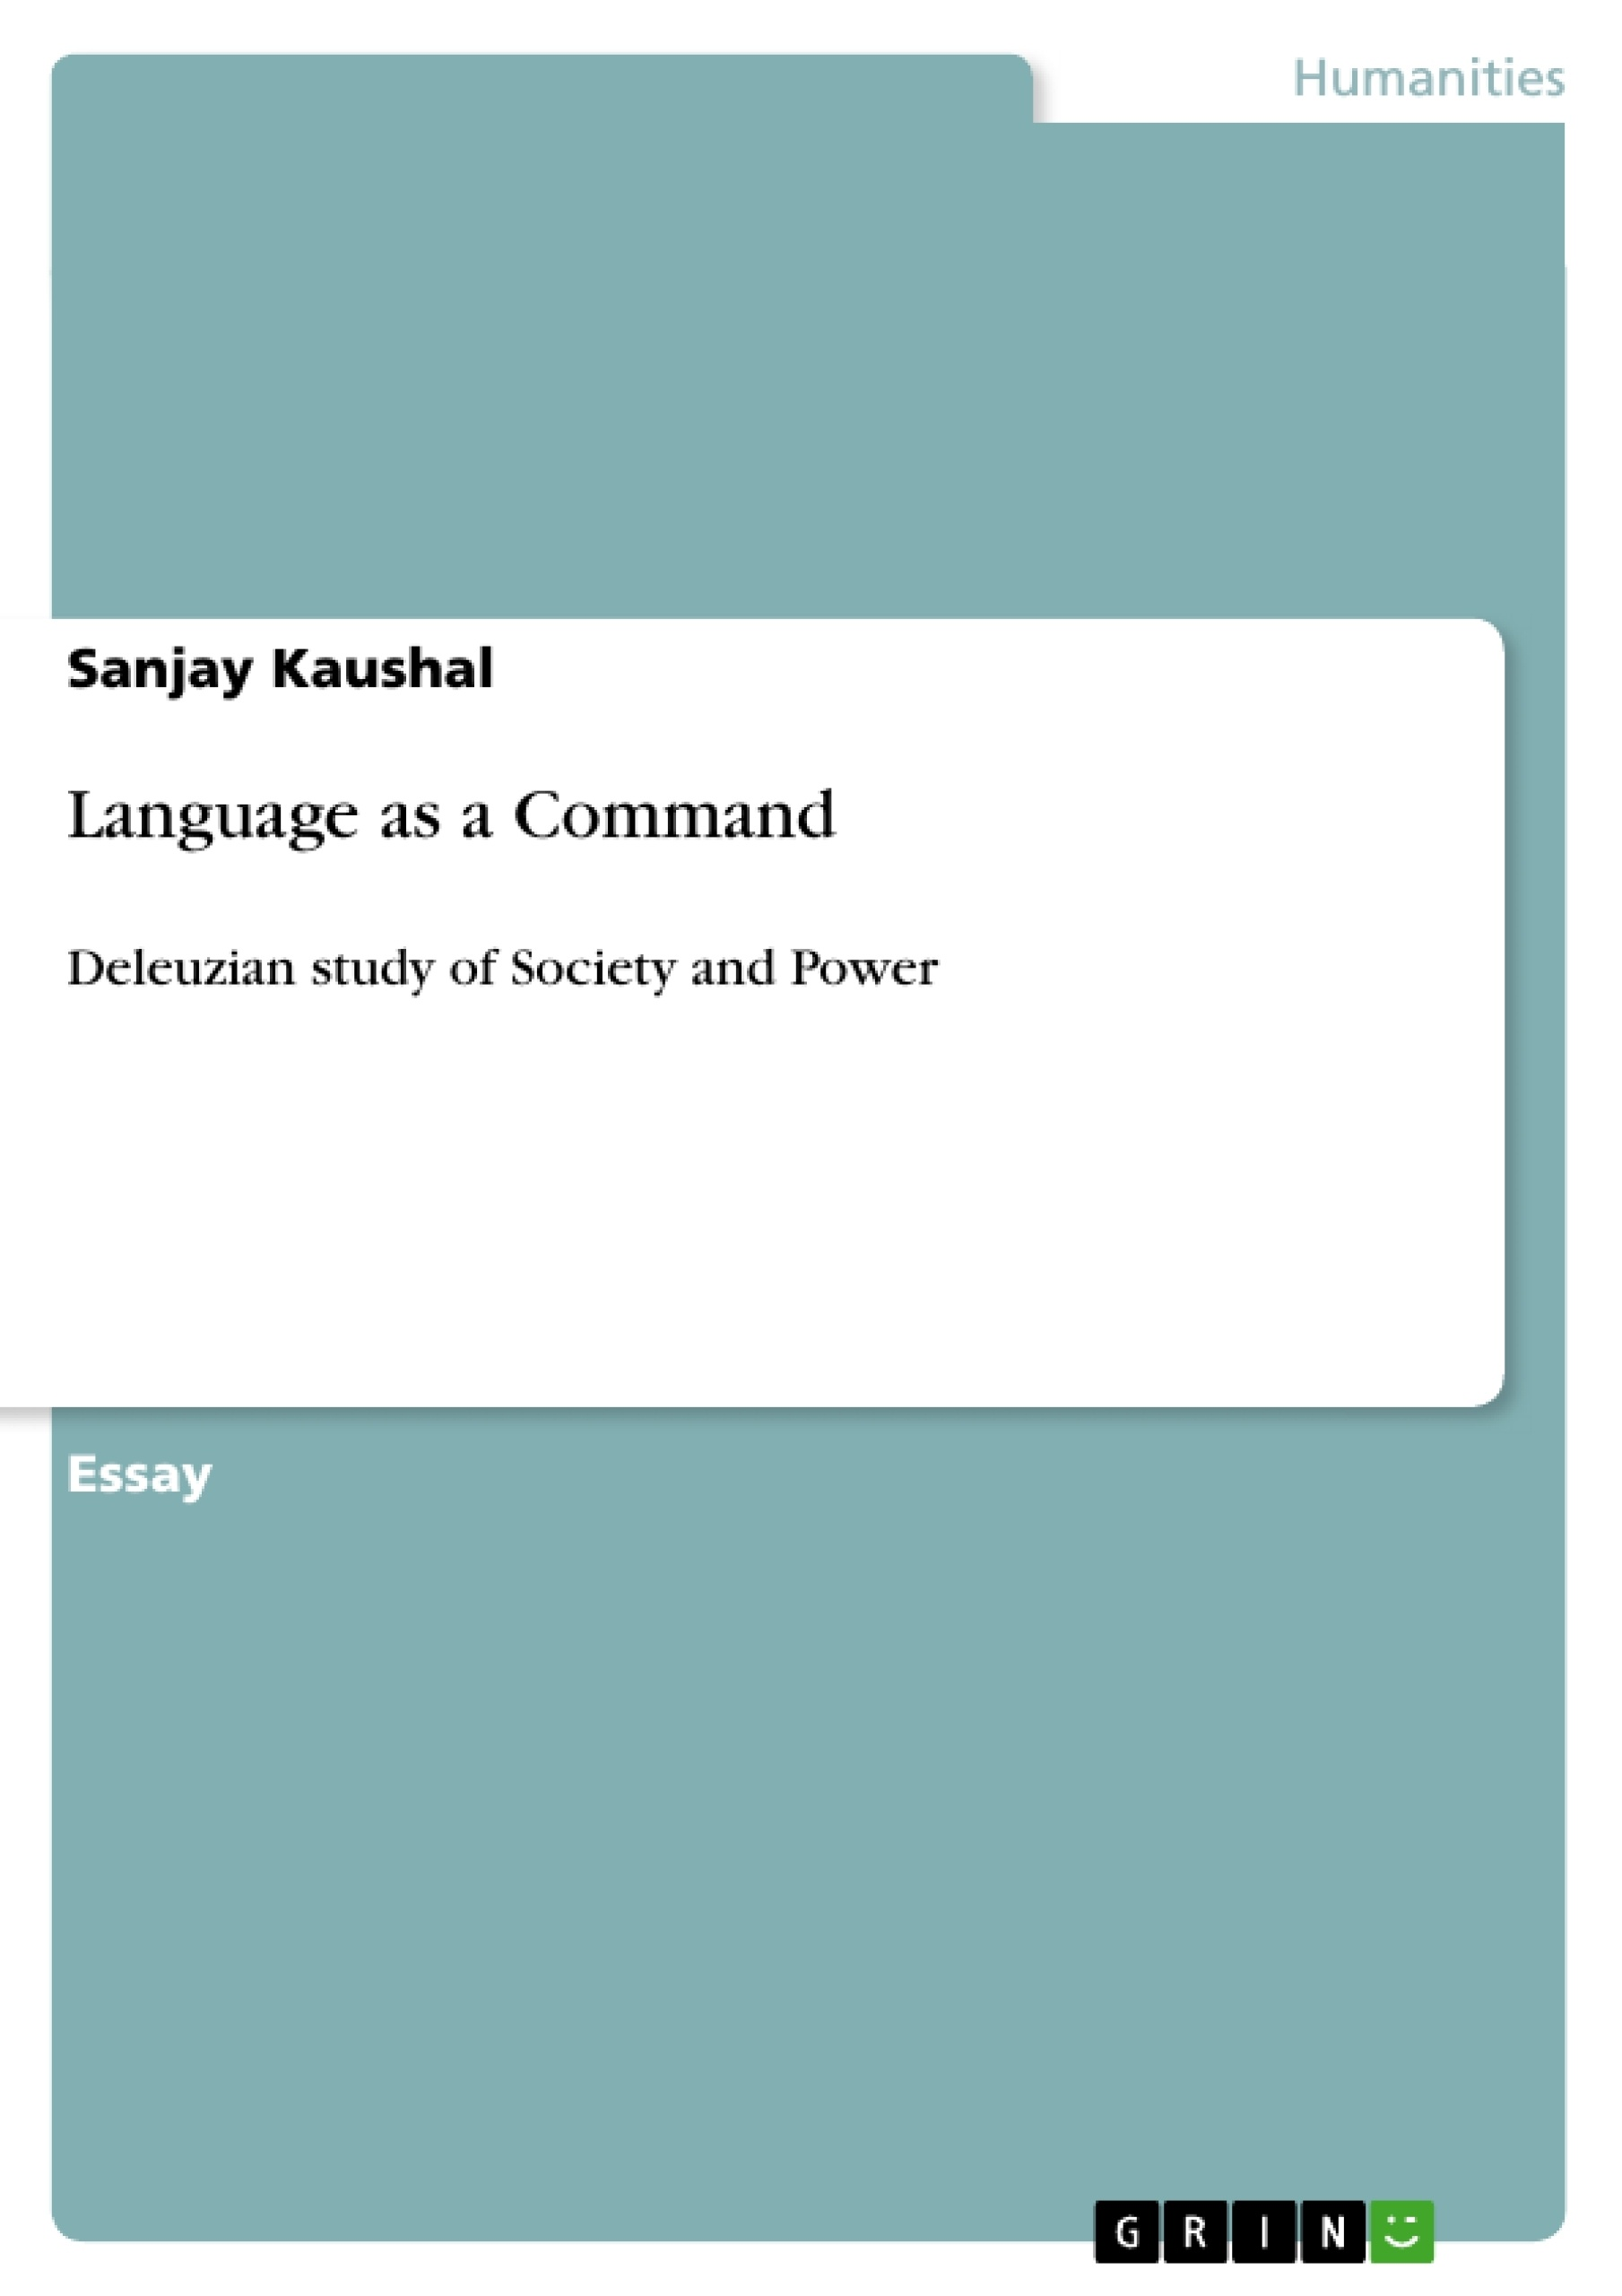 Title: Language as a Command